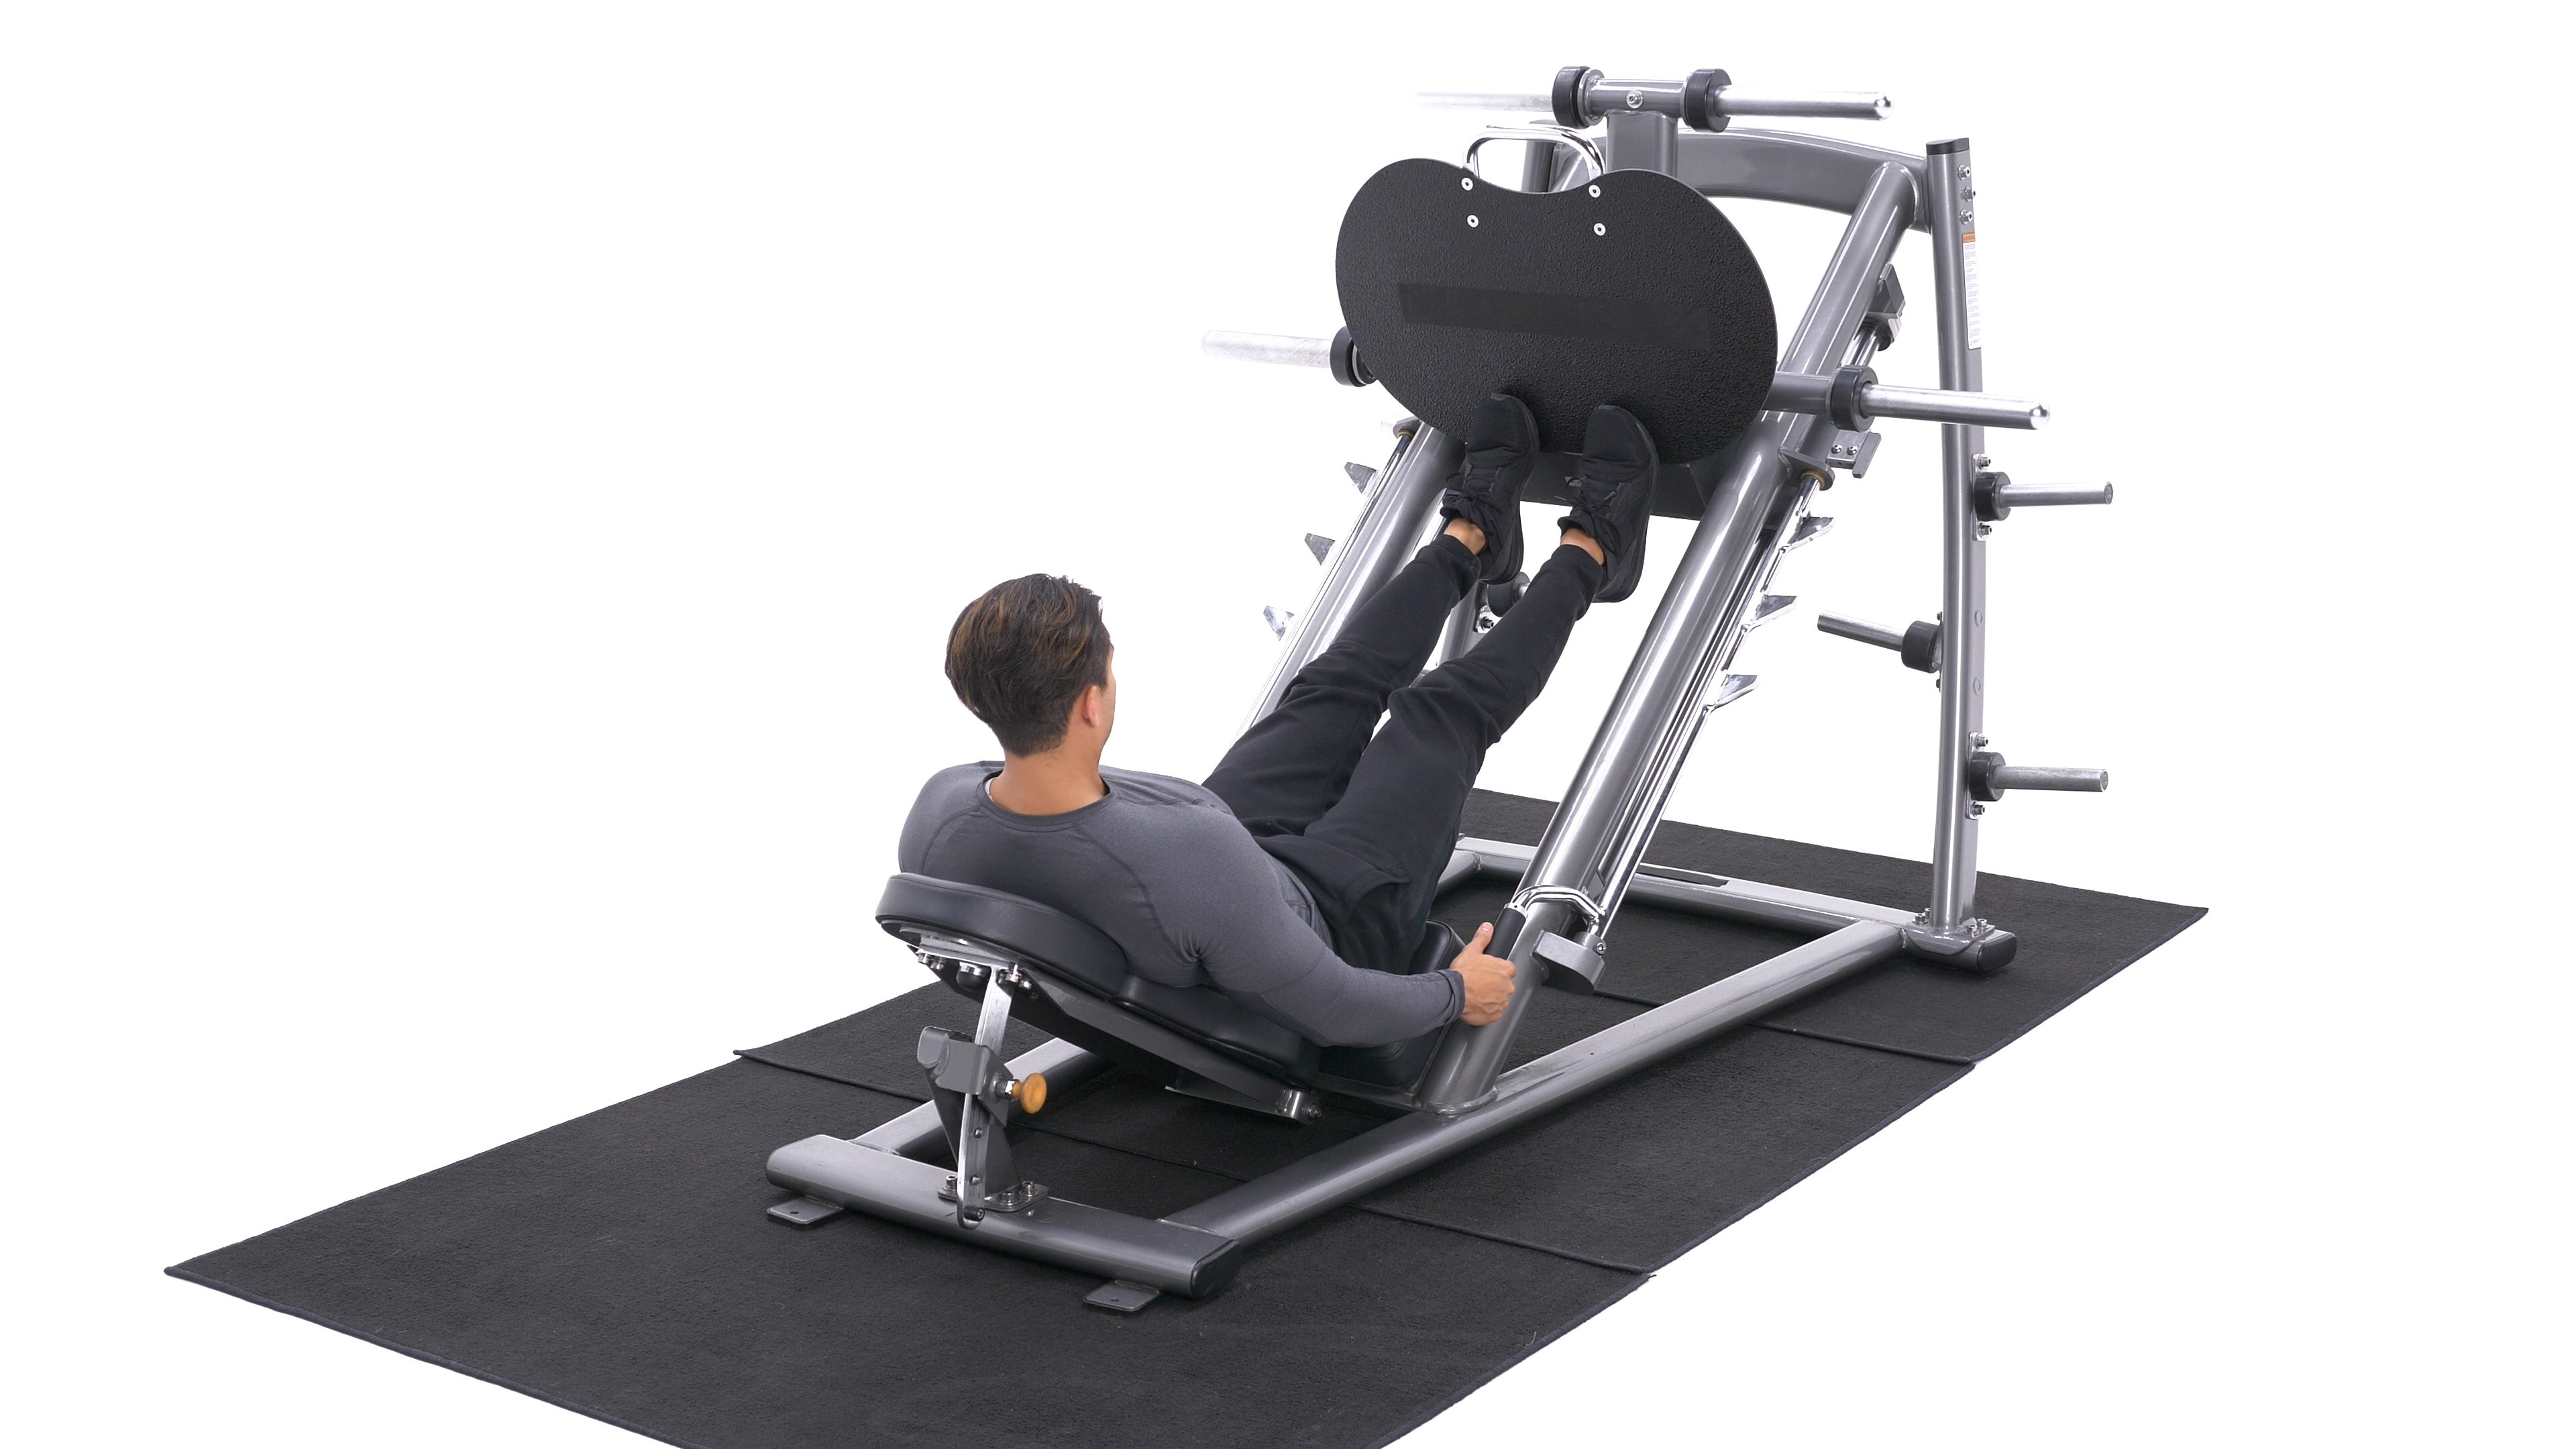 Calf Press On The Leg Press Machine image